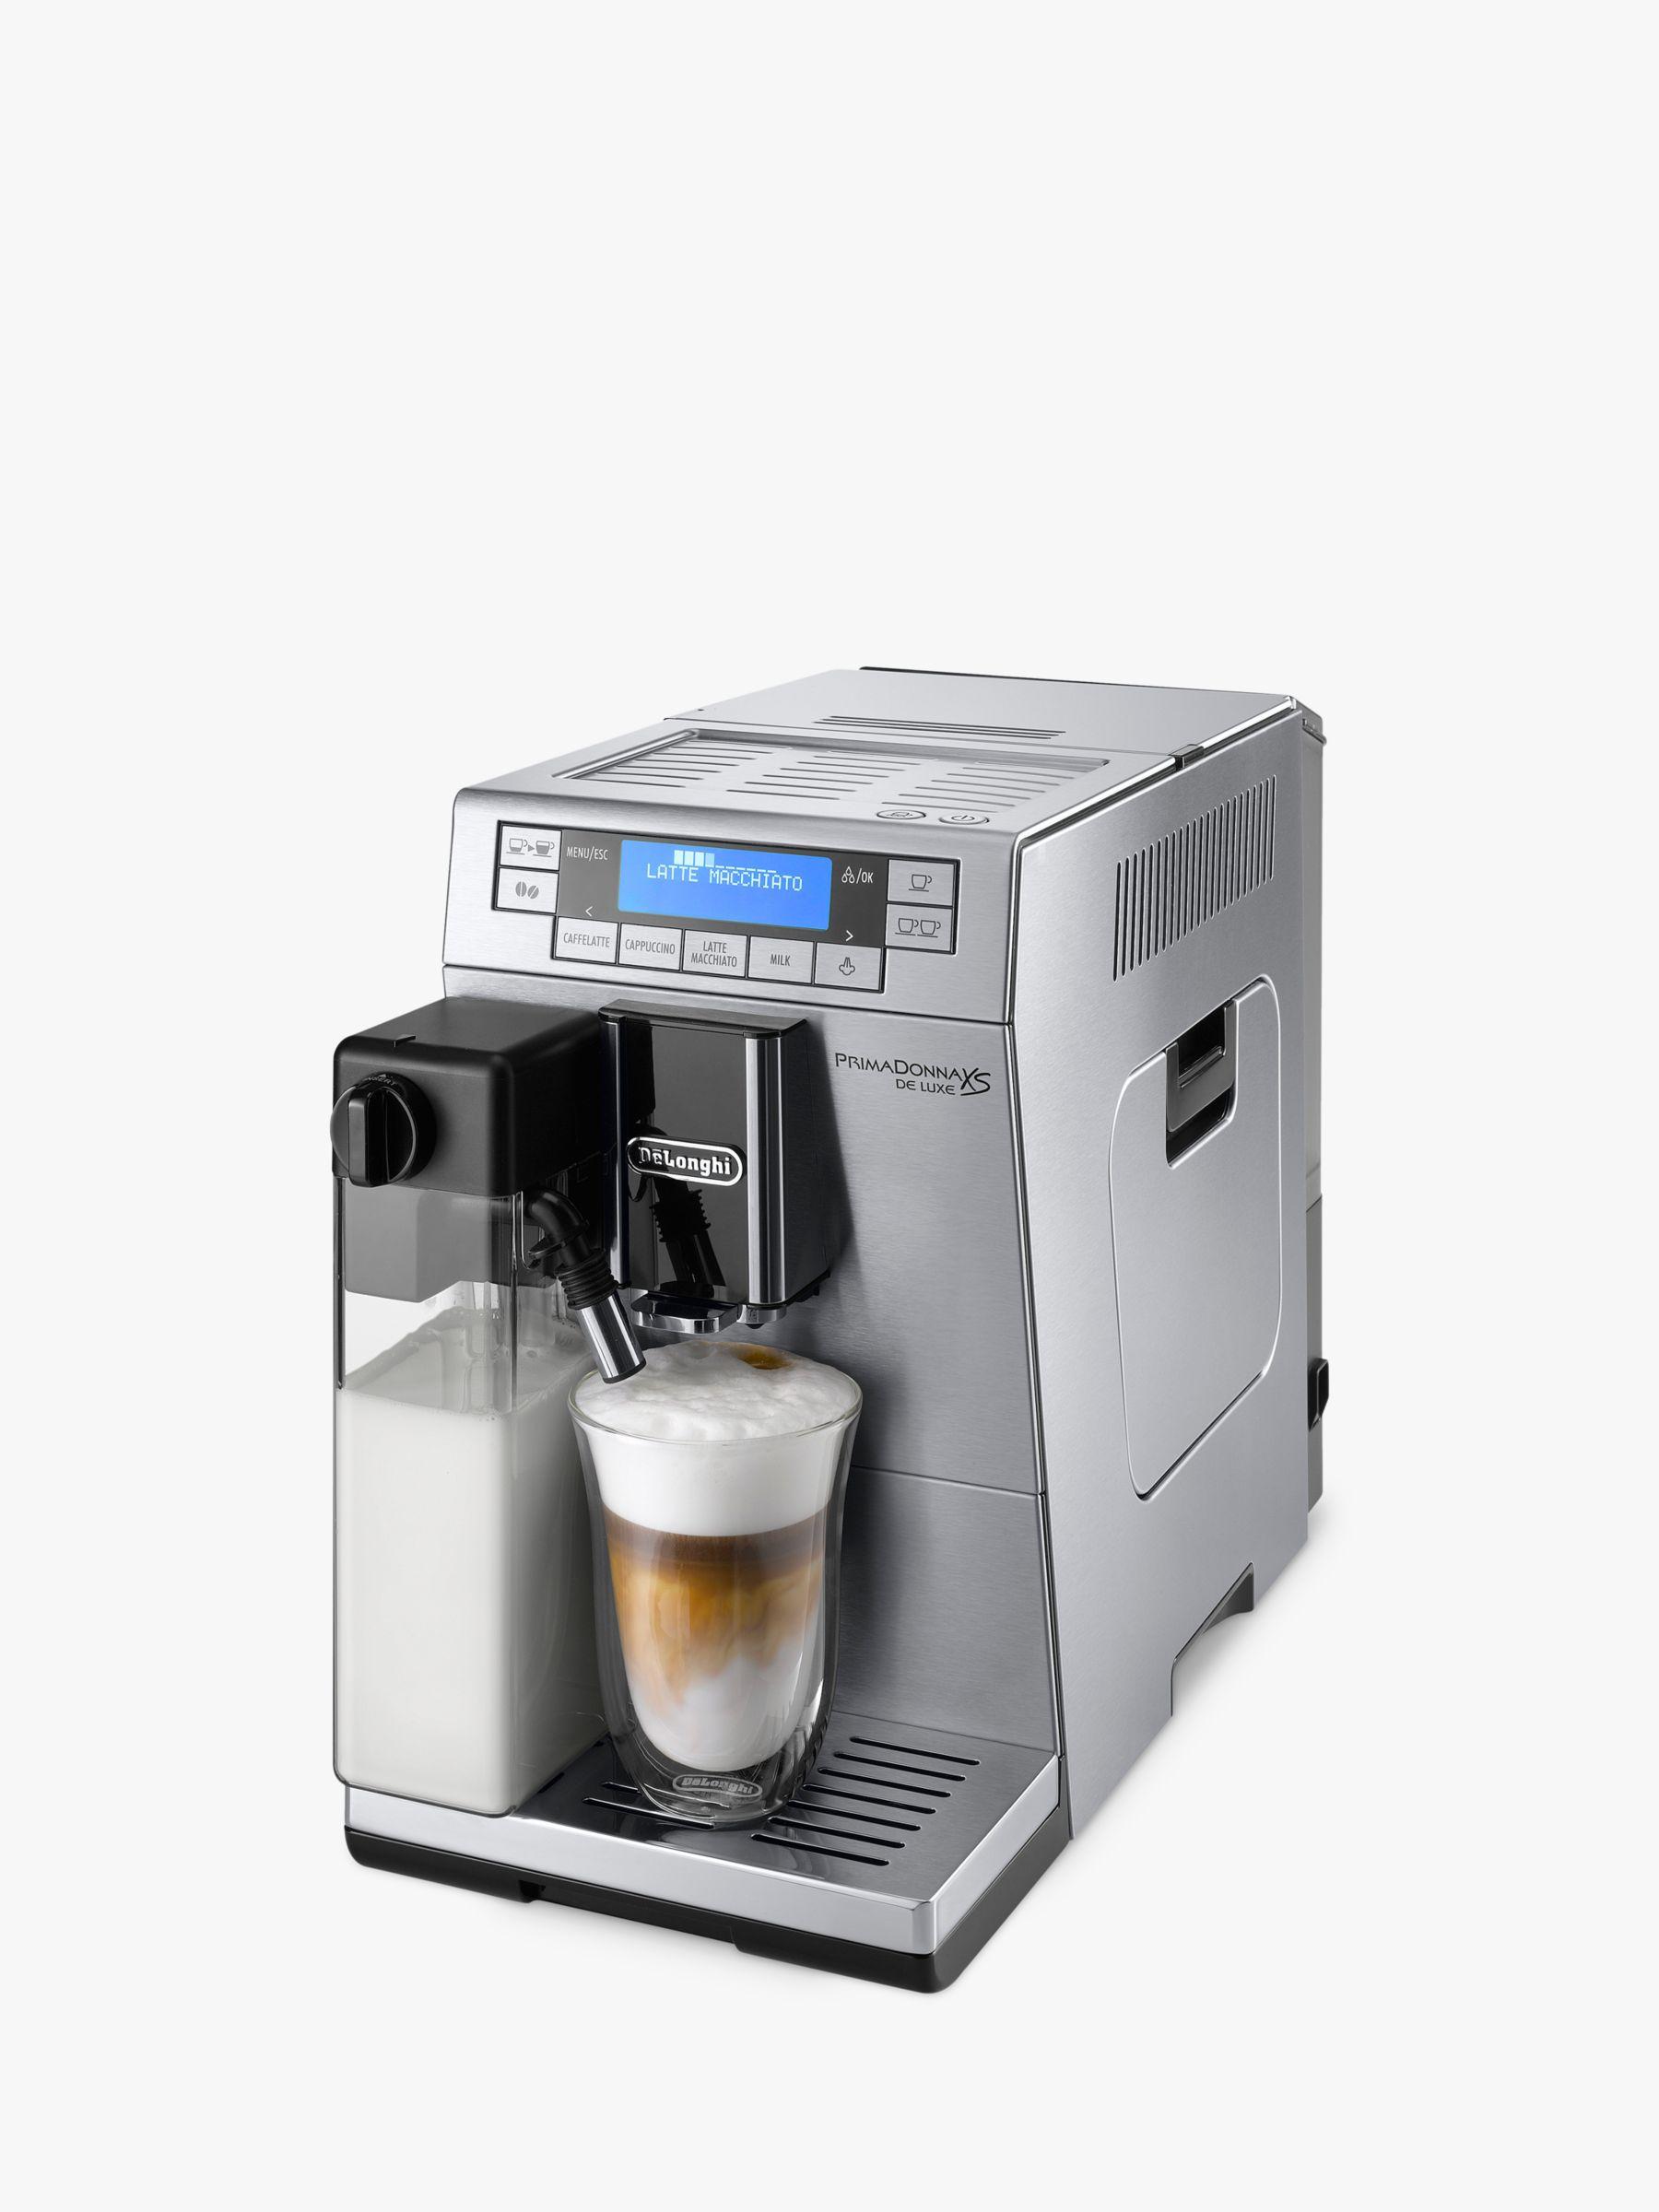 Electronic Prima Donna Delonghi Coffee Machine buy delonghi etam36 365 primadonna xs bean to cup coffee machine